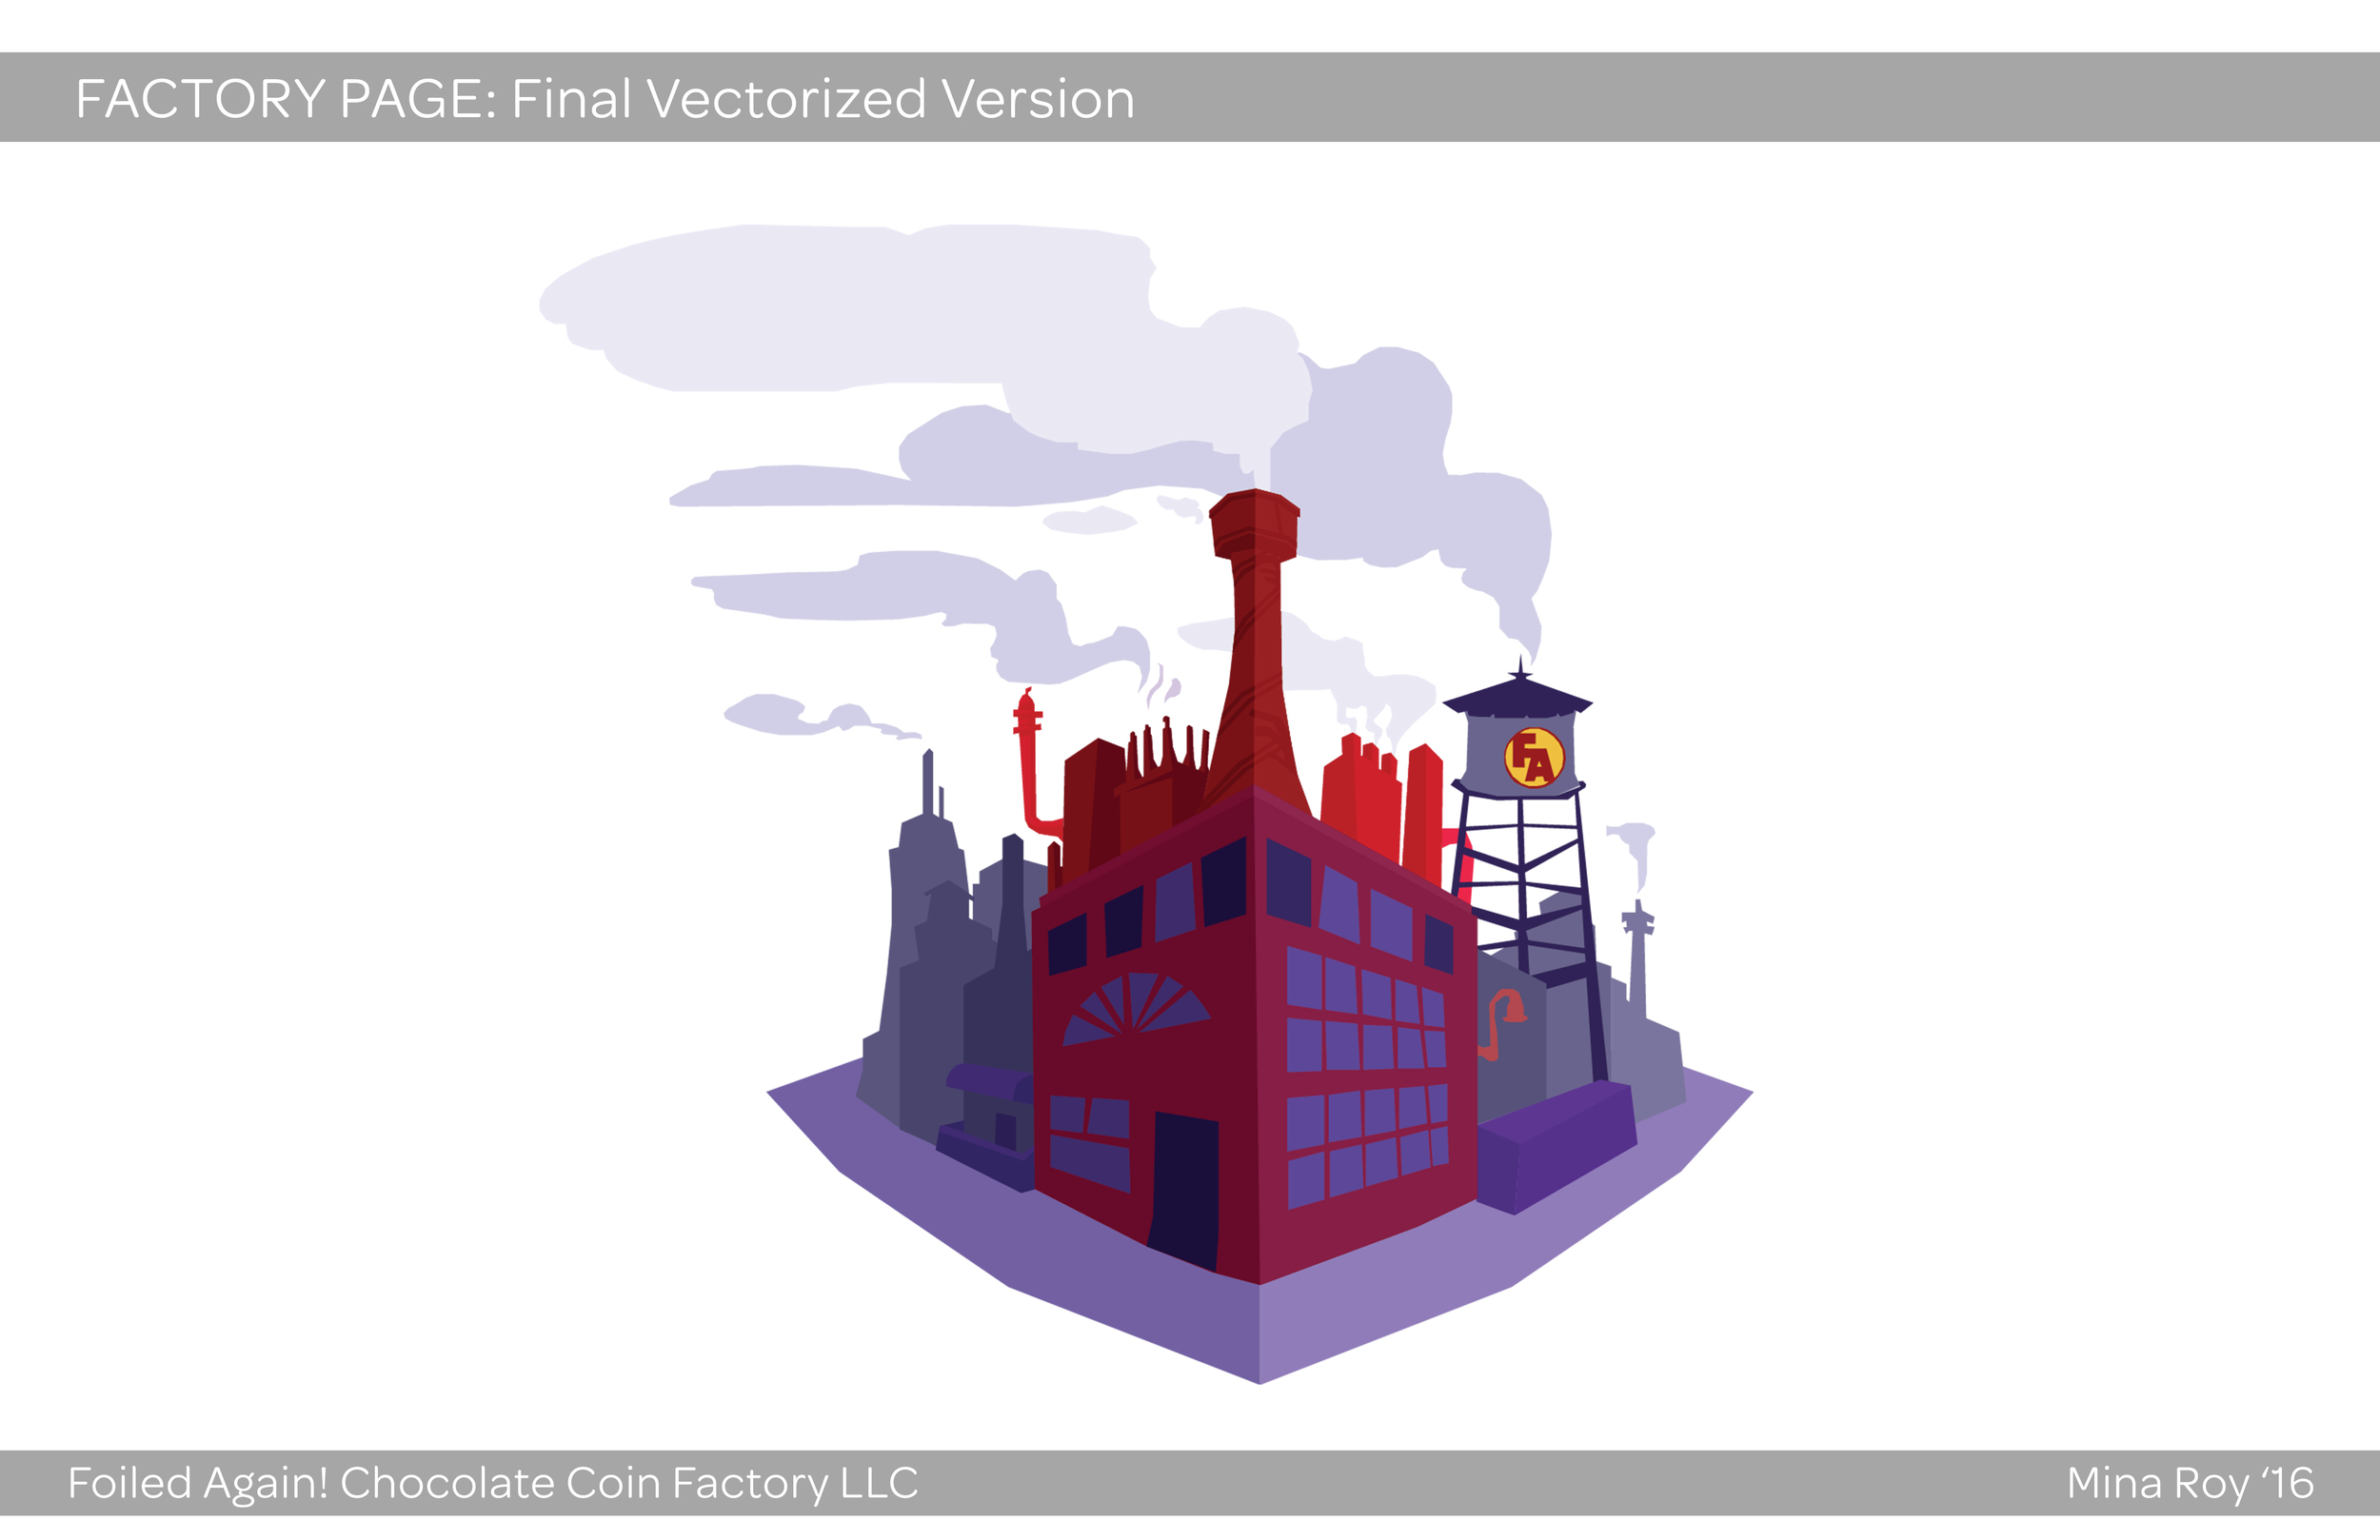 website-conceptdesign-factory-final-presentation.jpg